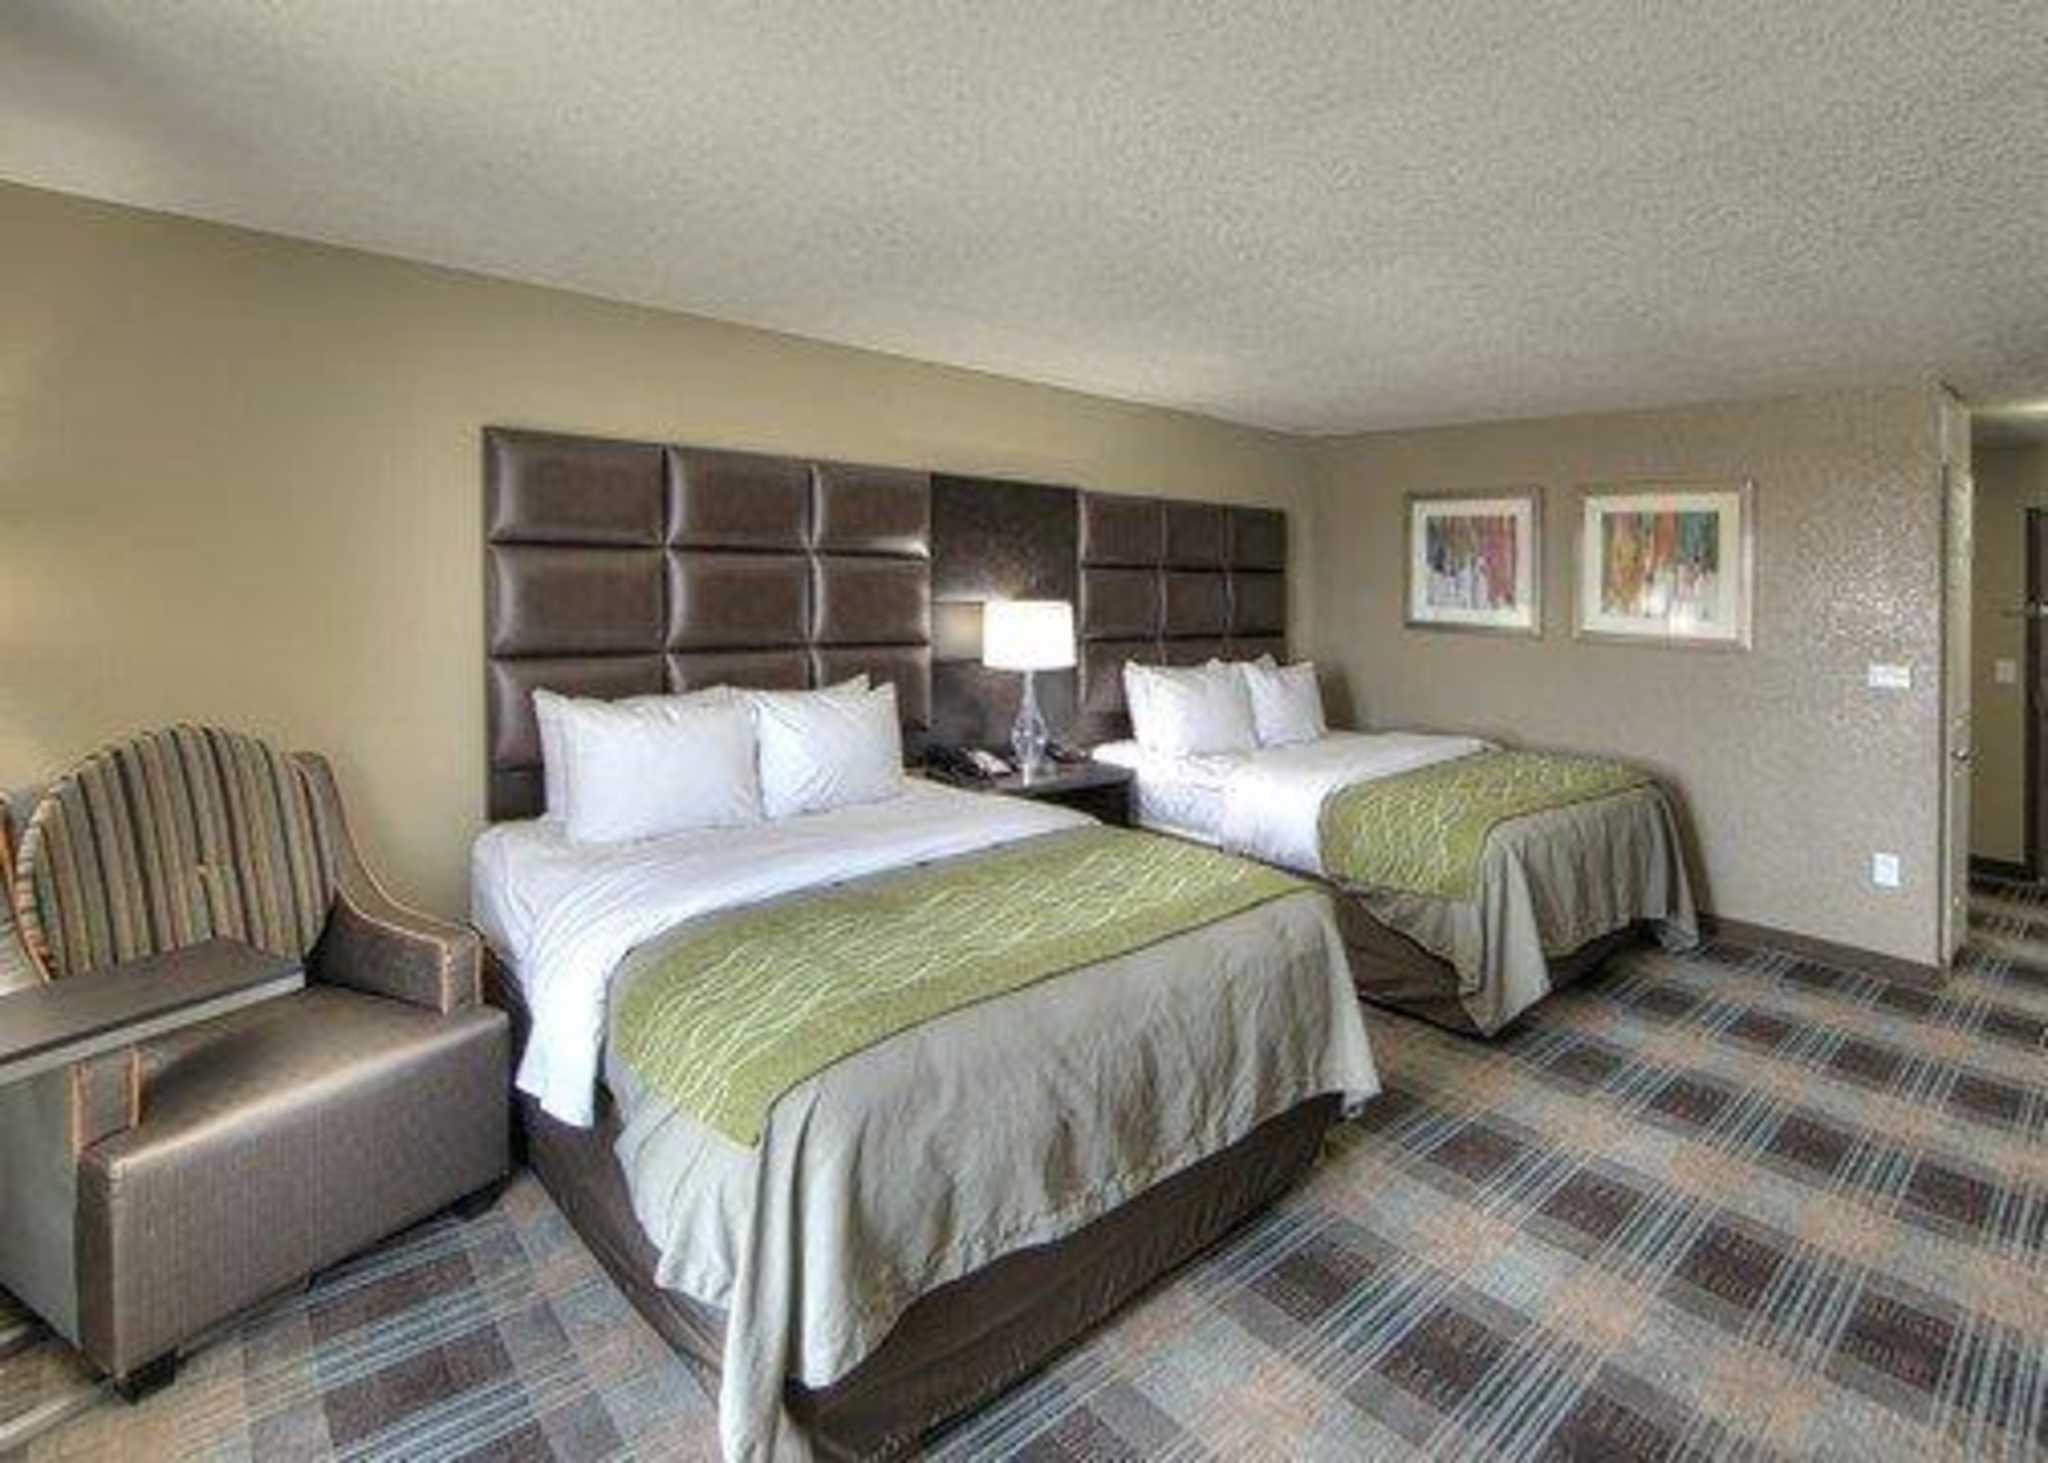 Comfort Inn & Suites Fort Worth West, Tarrant